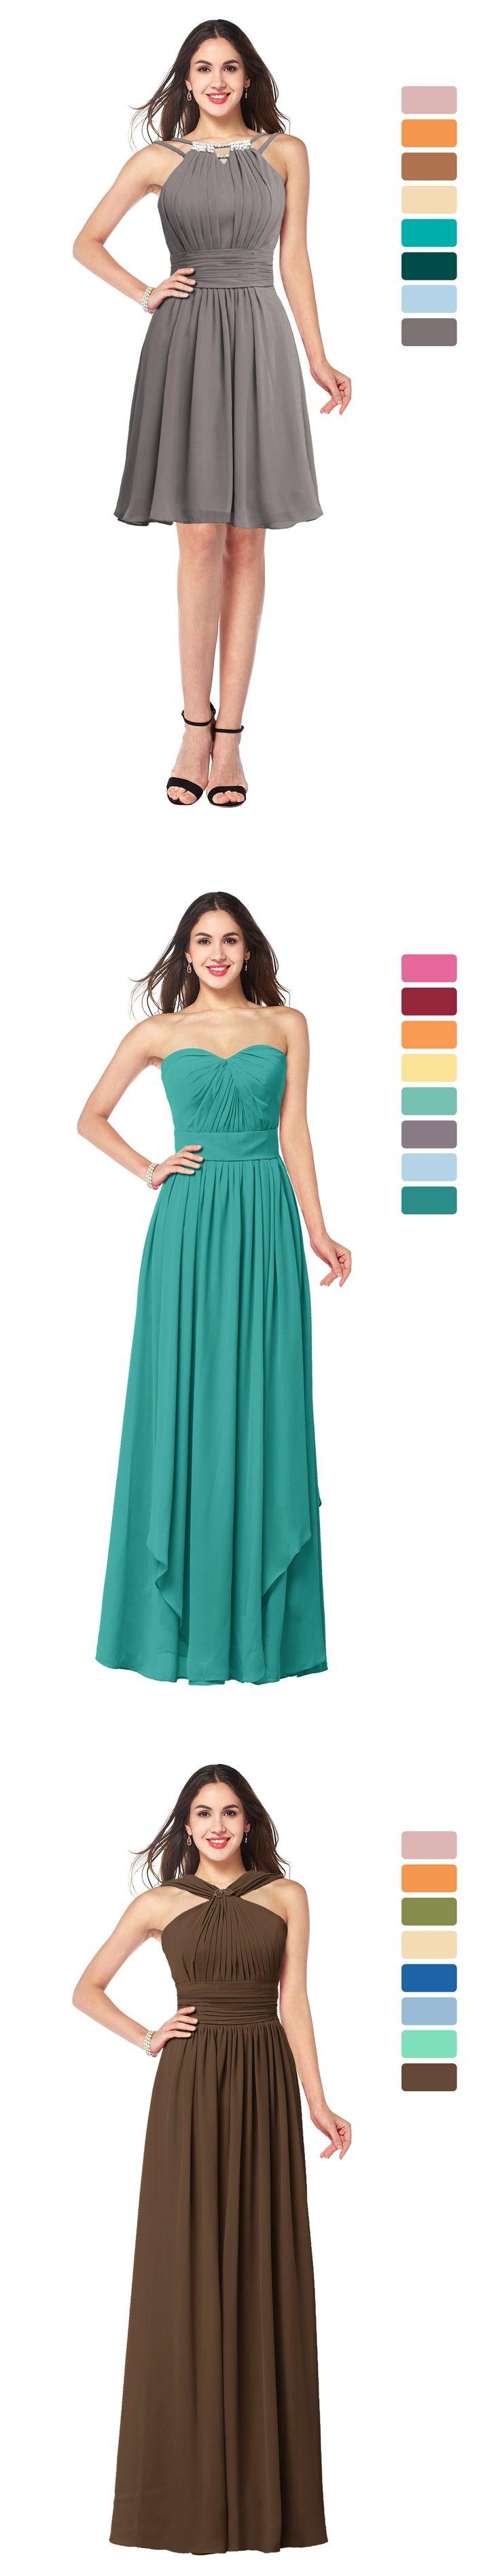 133 best Bridesmaid Dresses images by ColorsBridesmaid on Pinterest